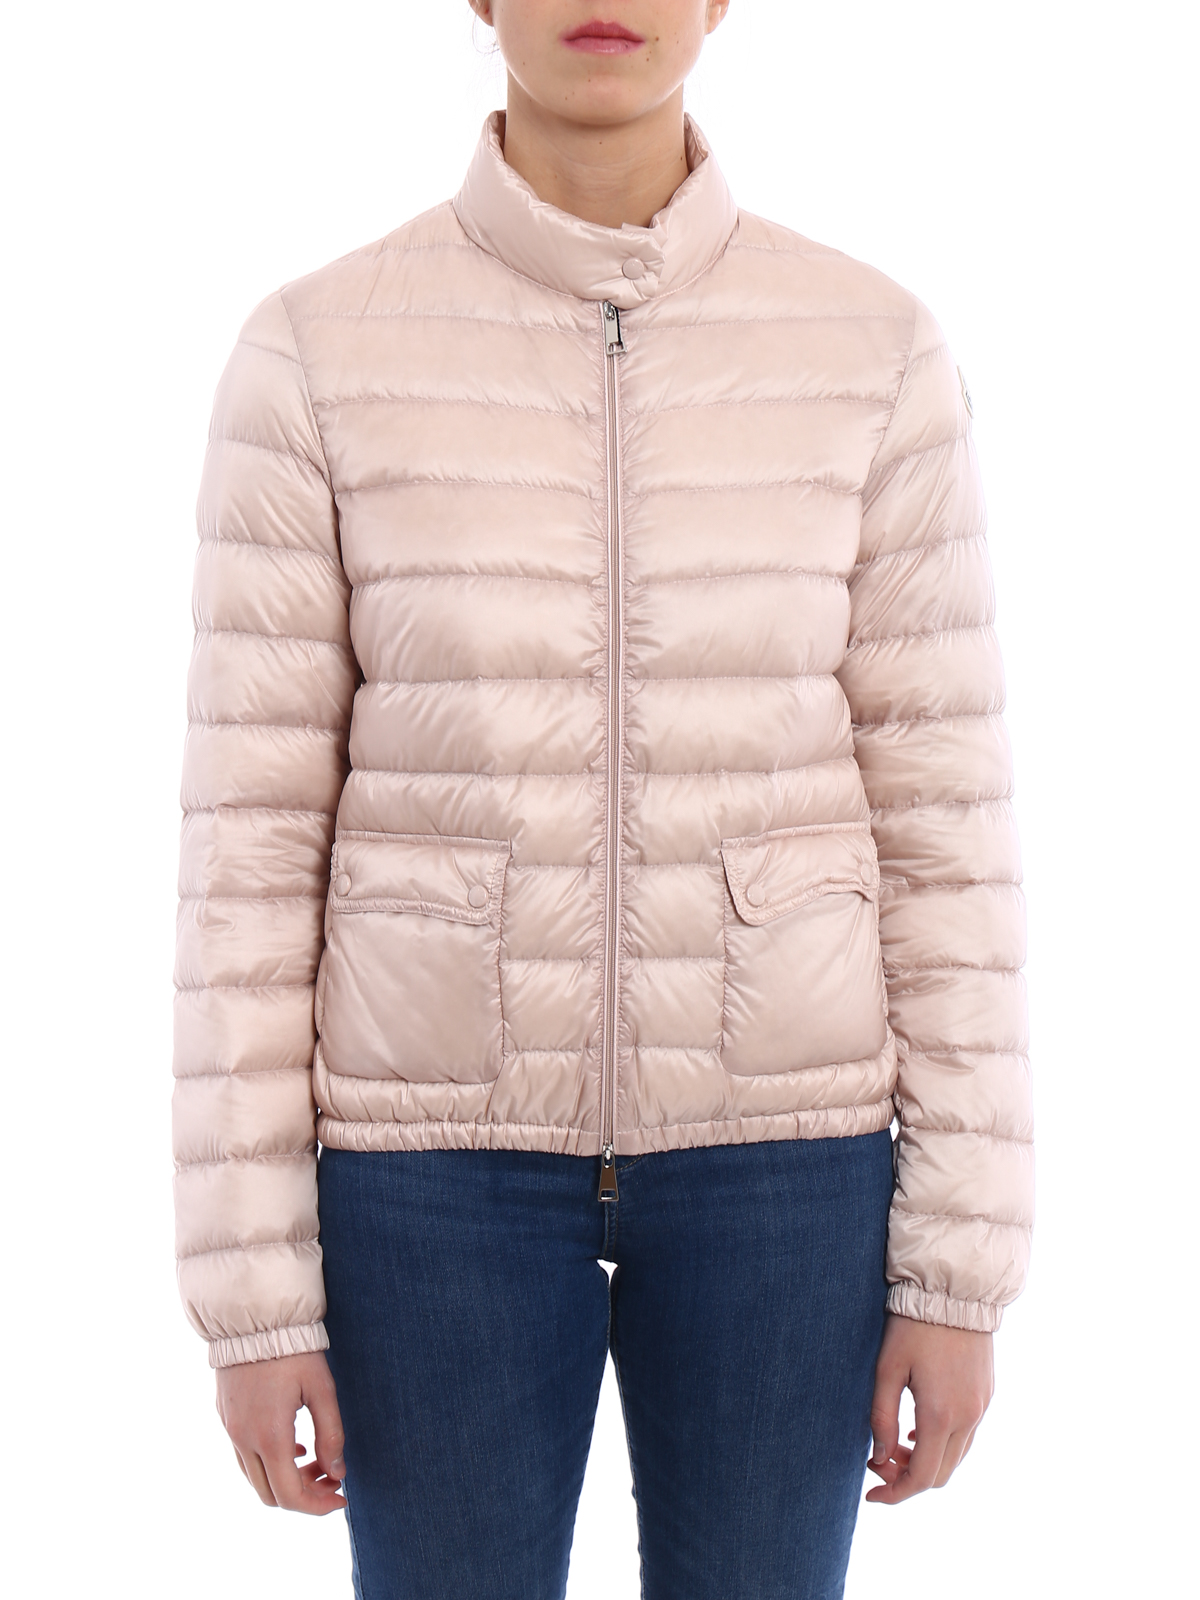 Moncler Lans light pink puffer jacket padded jackets